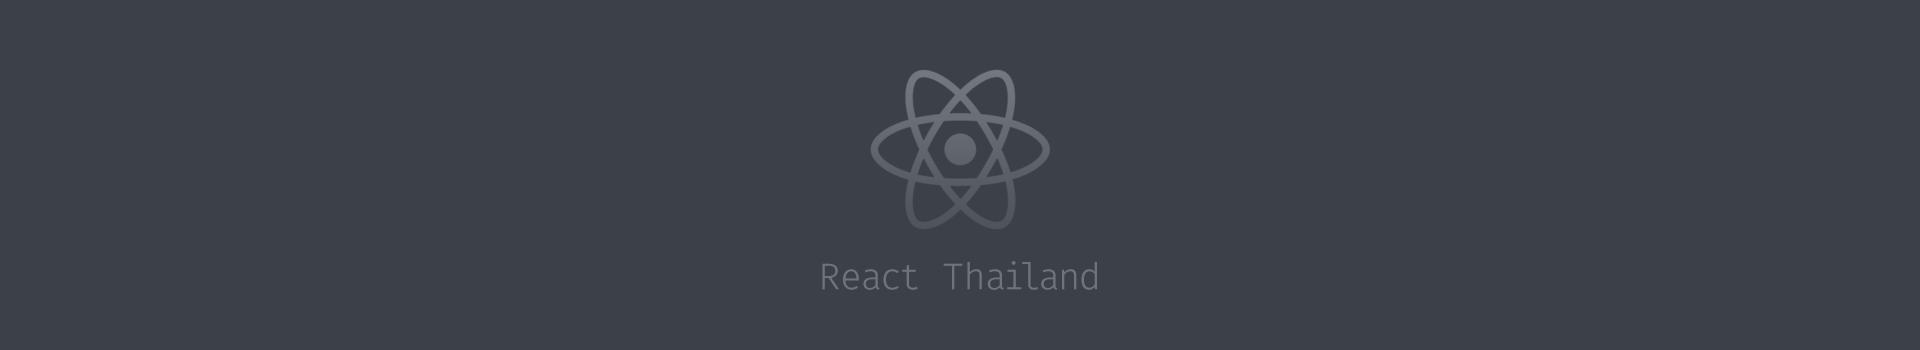 React Thailand cover photo